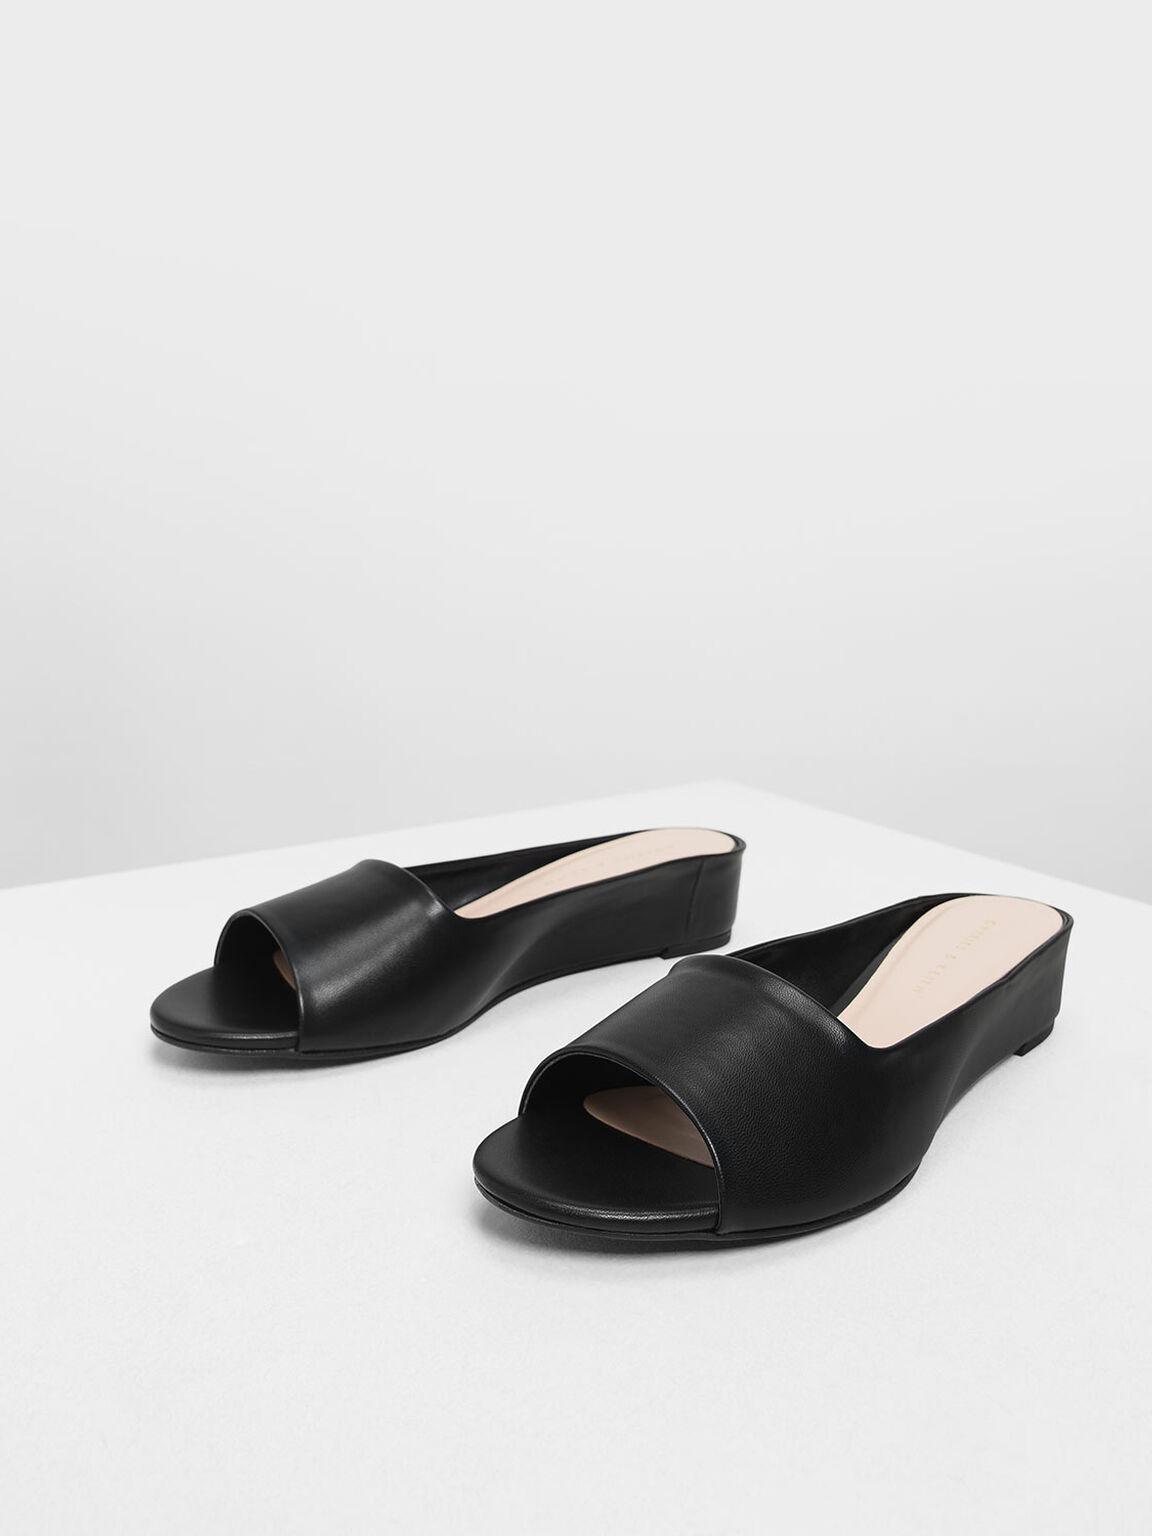 Open Toe Slide Sandals, Black, hi-res